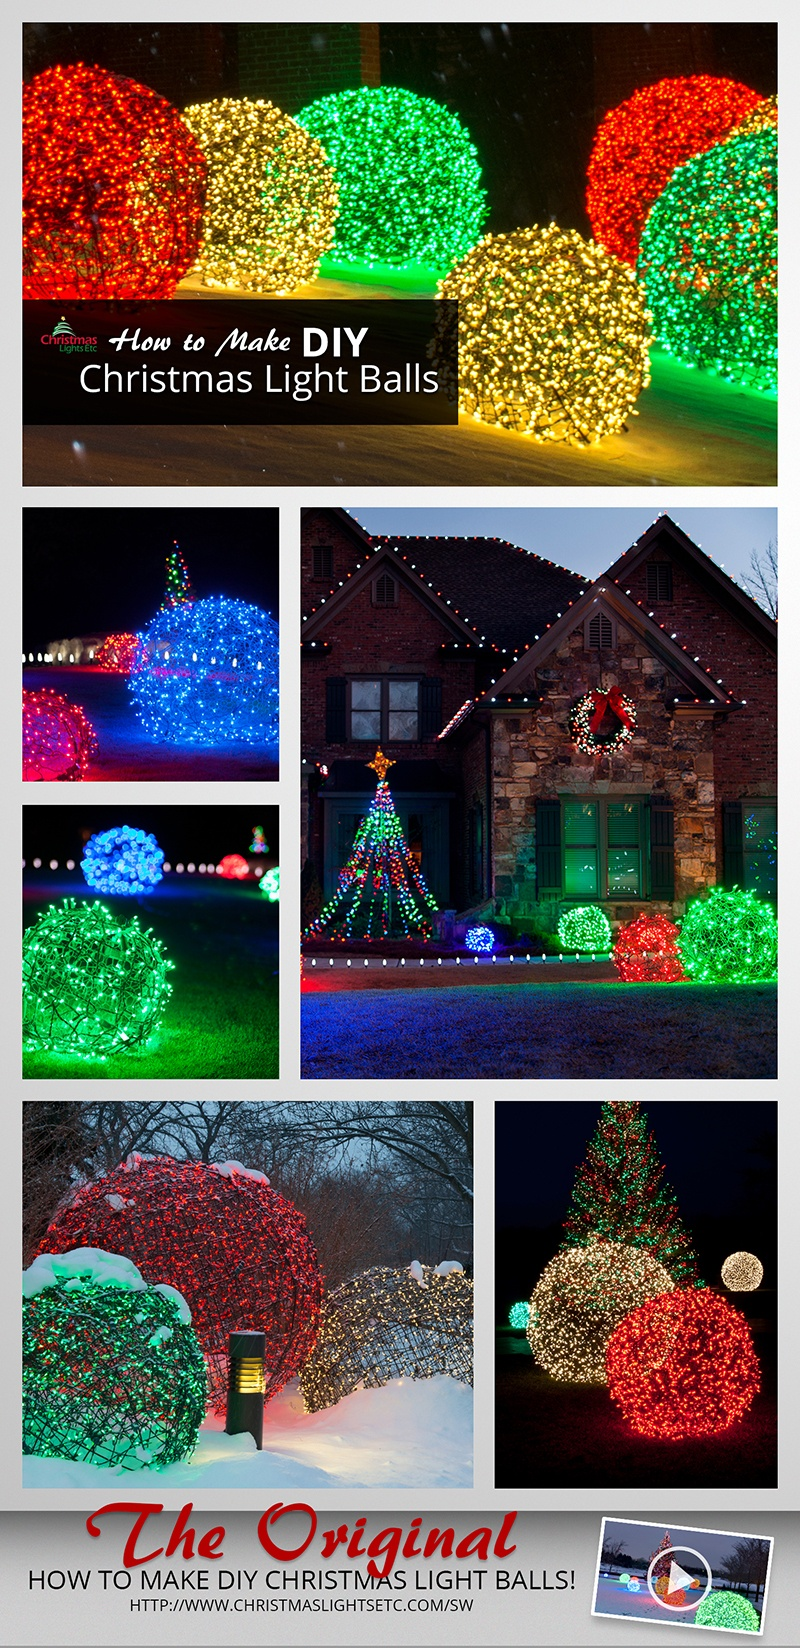 Outdoor Christmas Decoration Ideas - How to Make DIY Christmas Light Balls